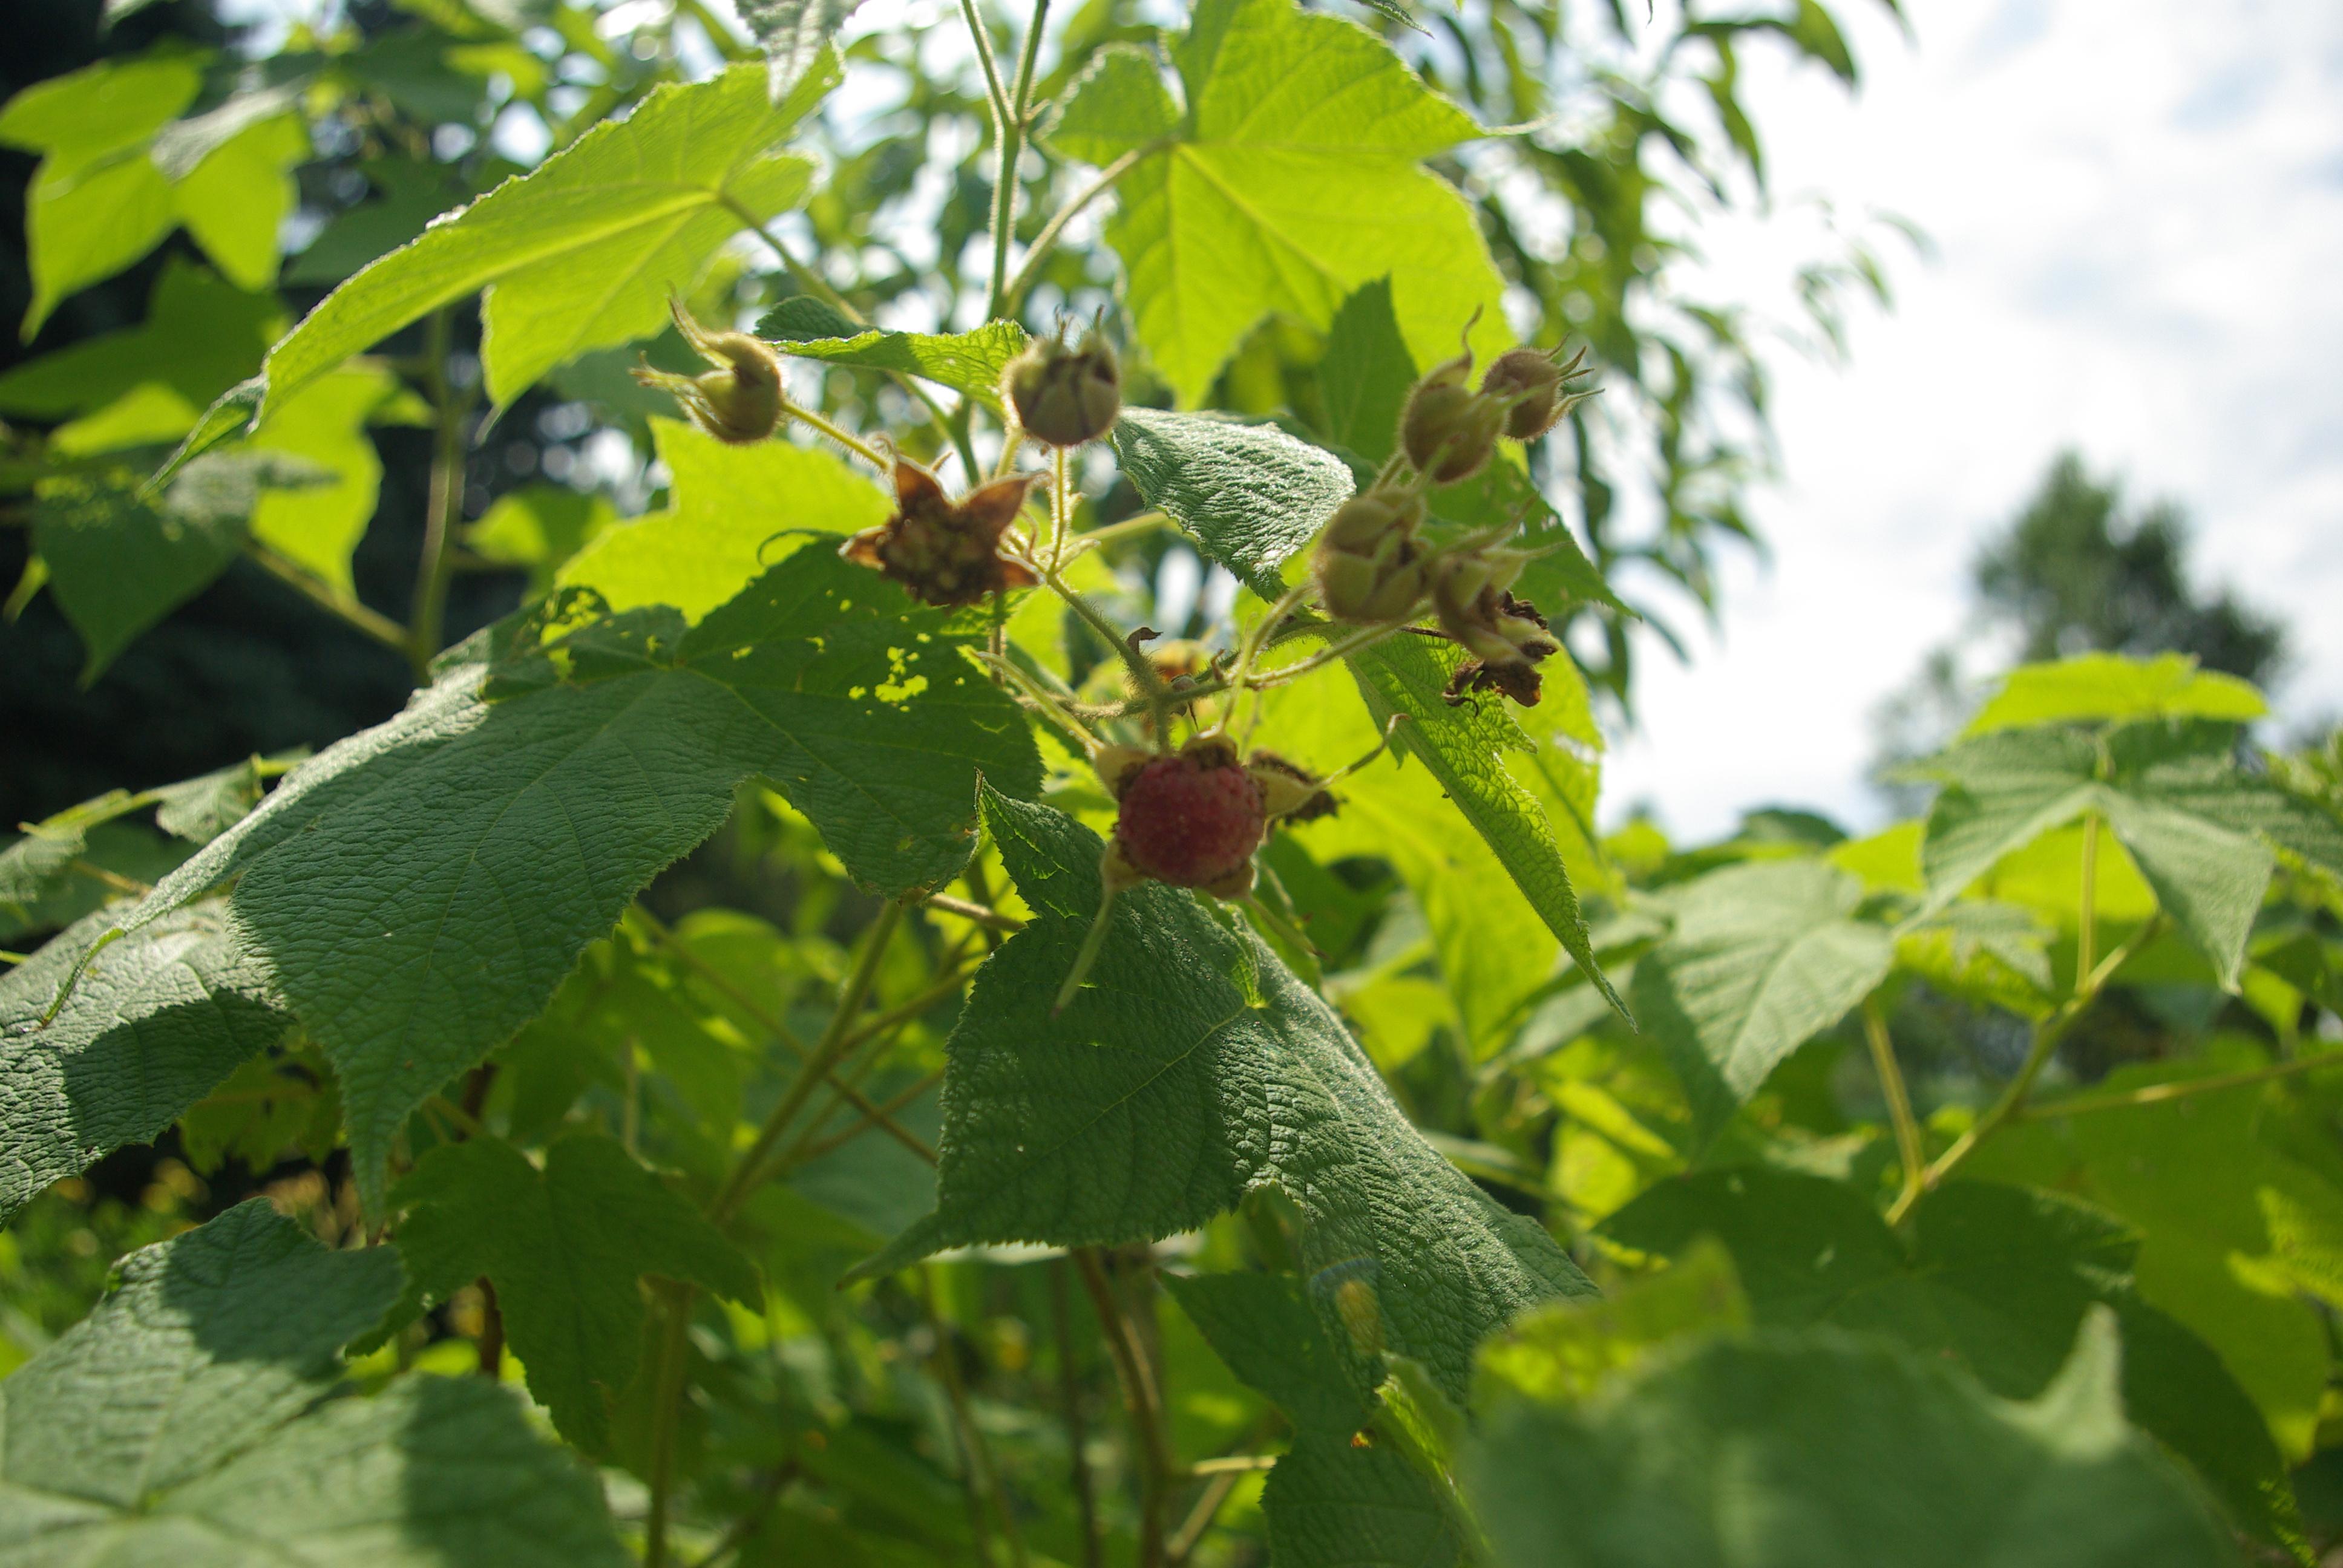 Purple Flowering Raspberry An Ornamental Edible The Fruit Nut